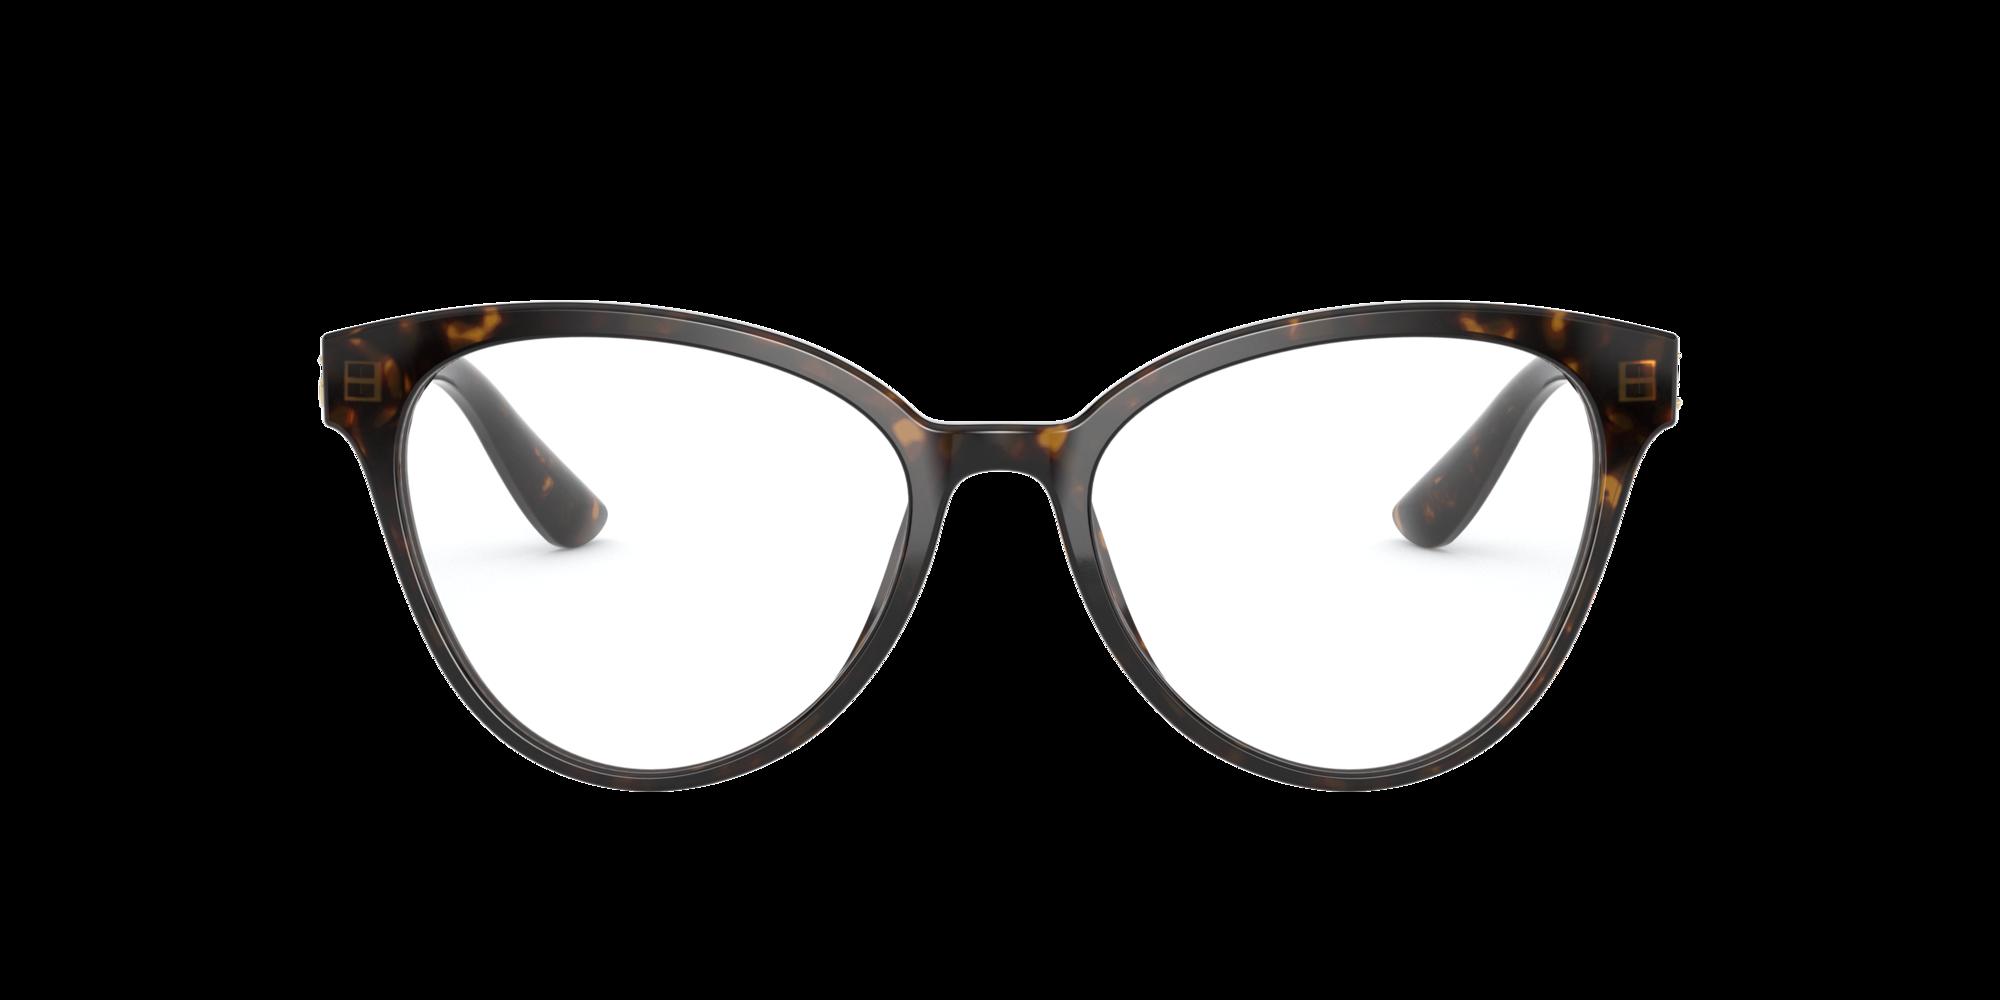 Image for DG3320 from LensCrafters | Glasses, Prescription Glasses Online, Eyewear